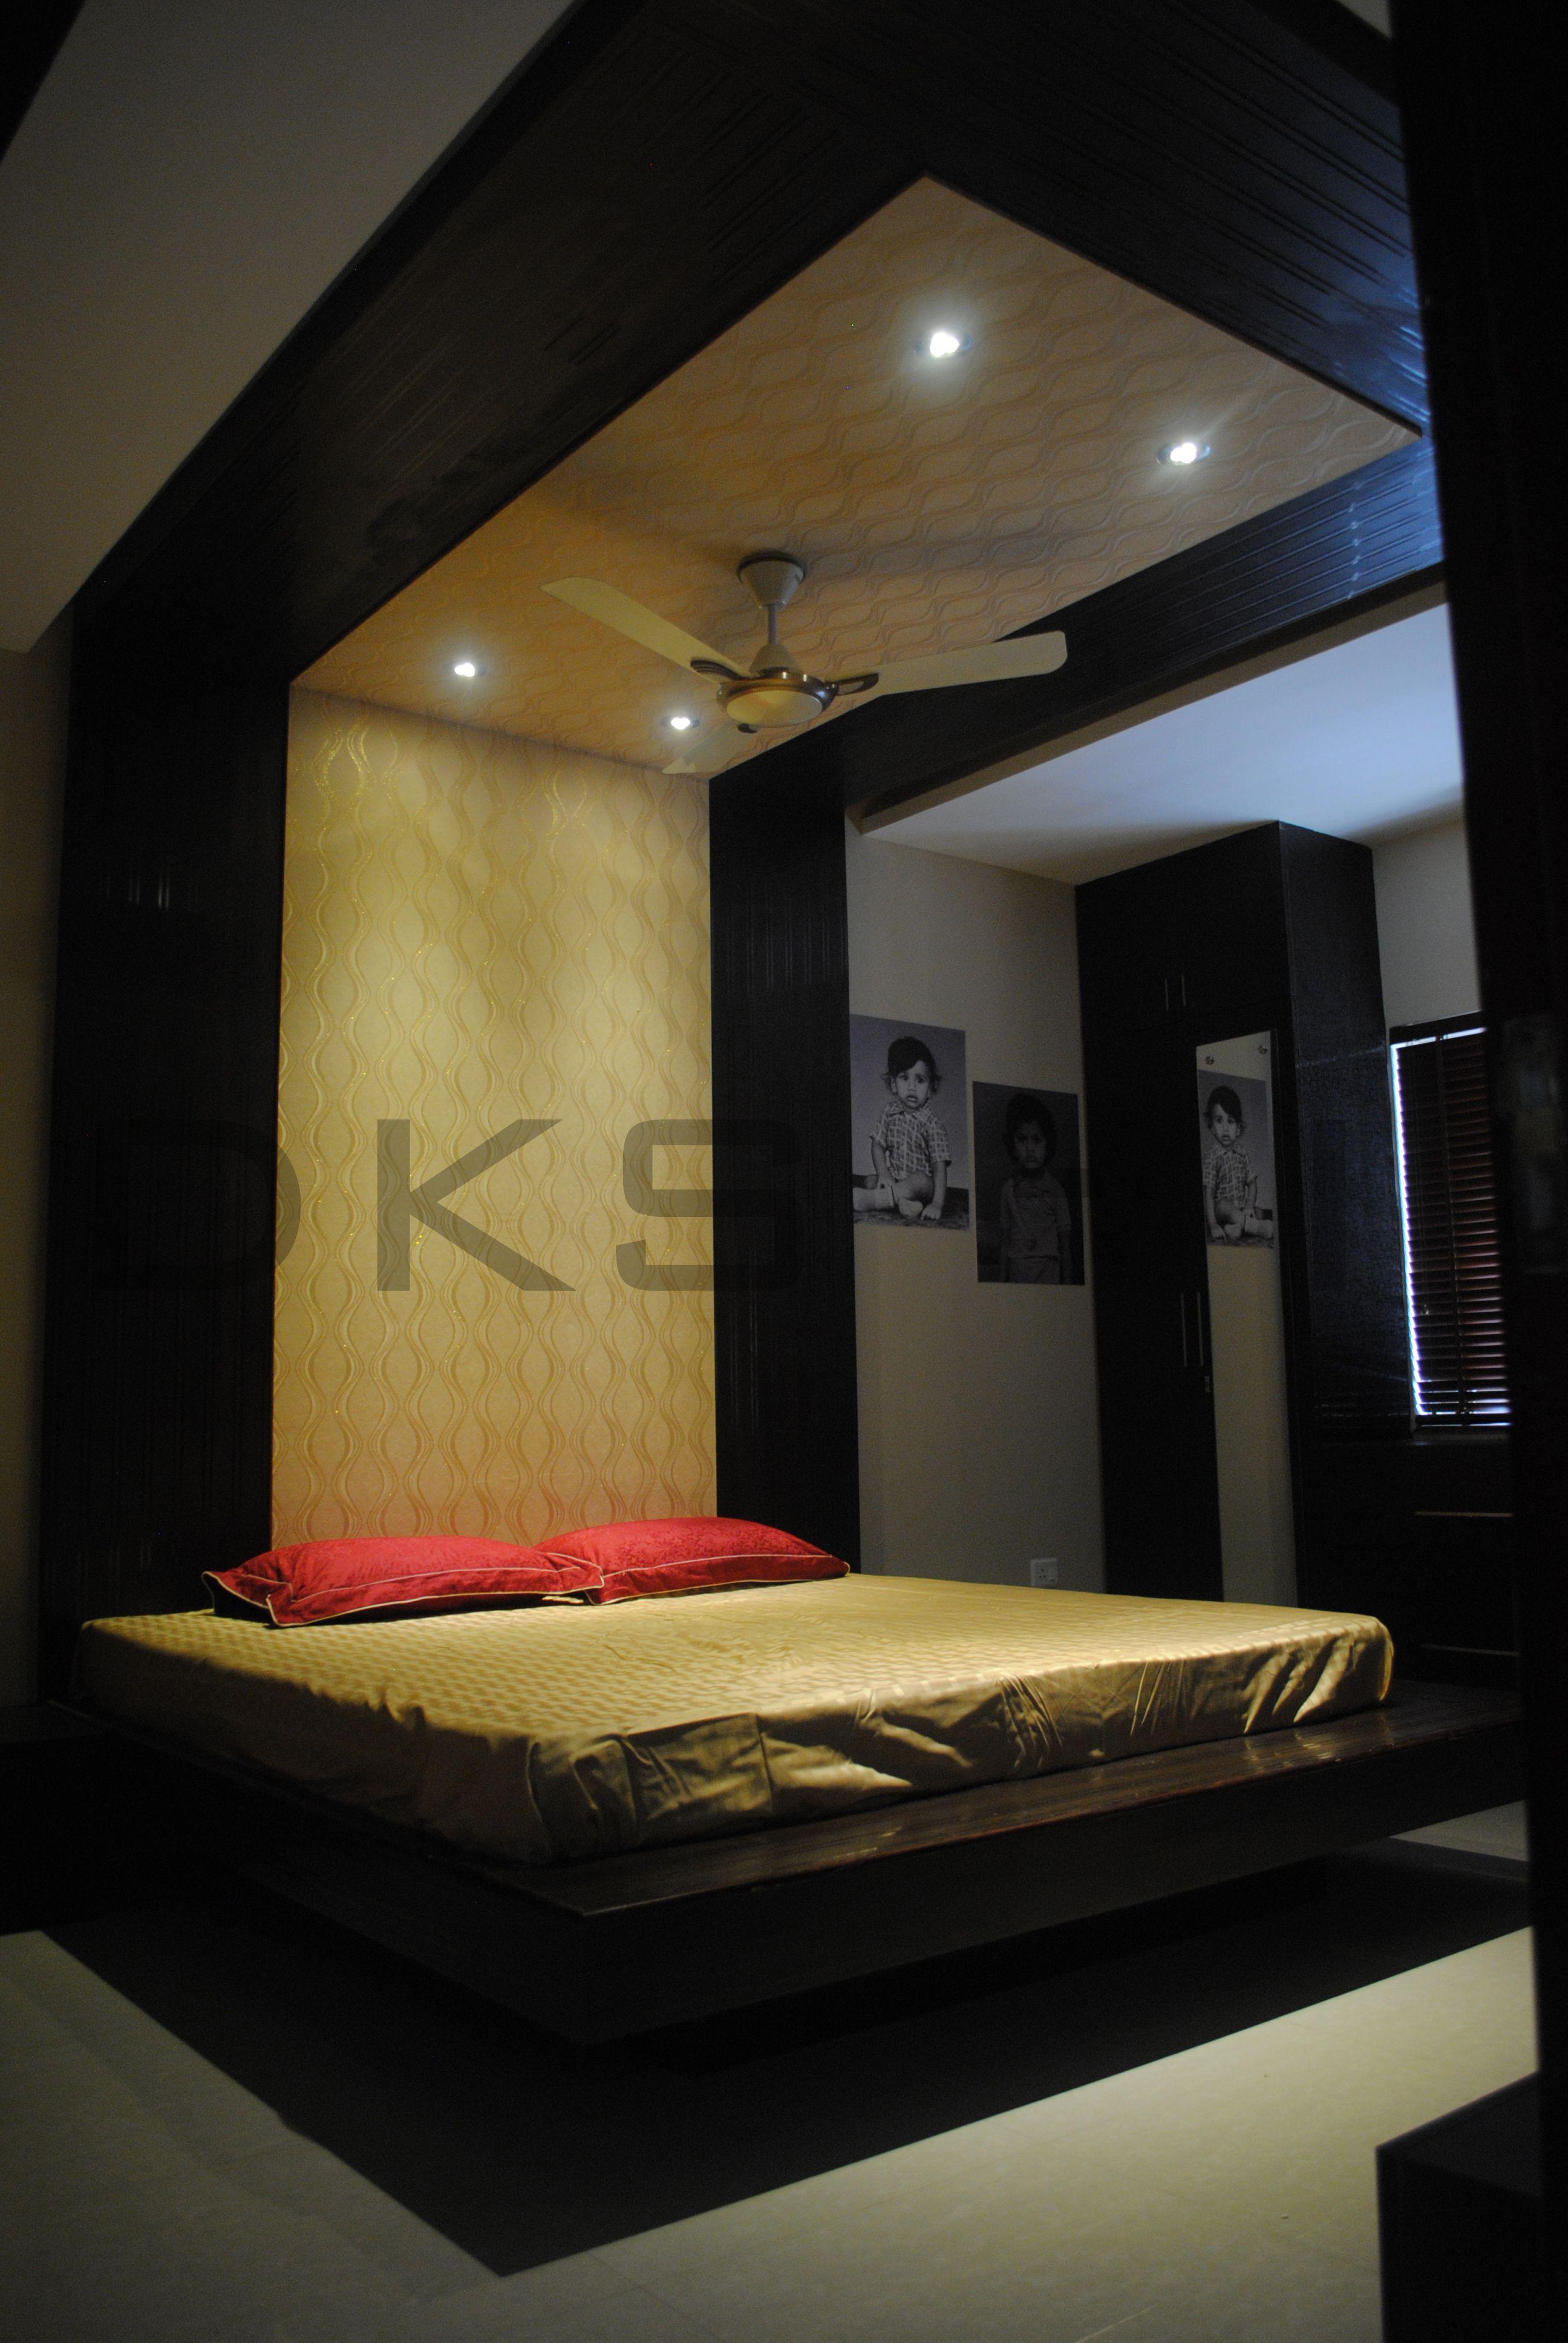 Linea bedroom furniture, master bedroom designs for cot ...